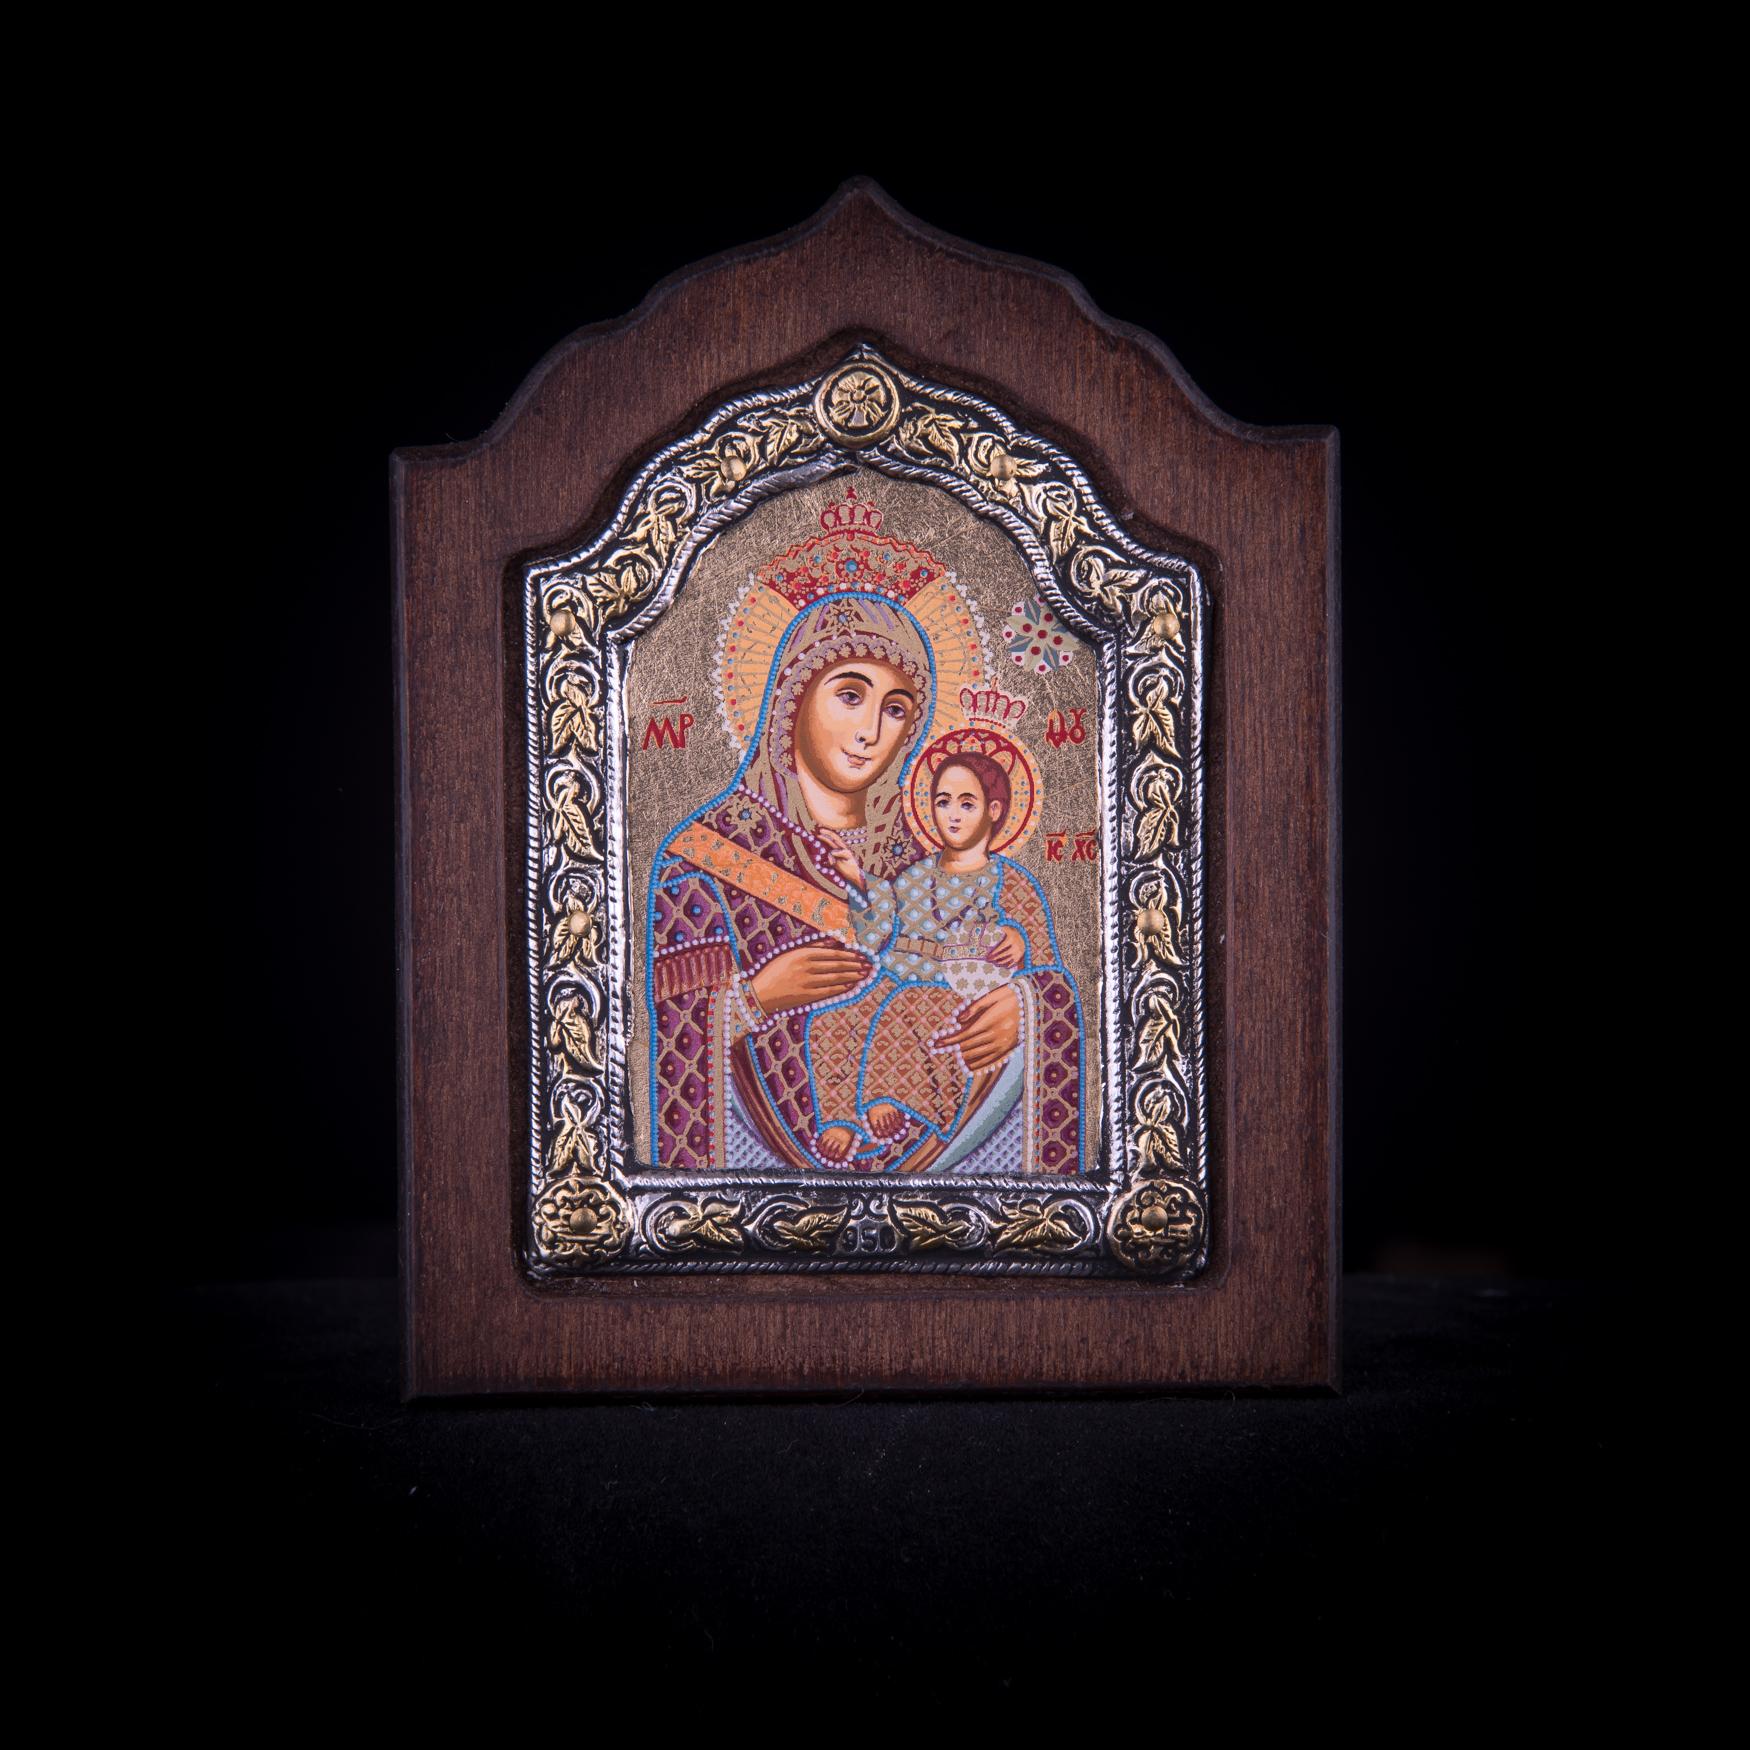 002/0051Silver icon of virgin Mary of Bethlehem